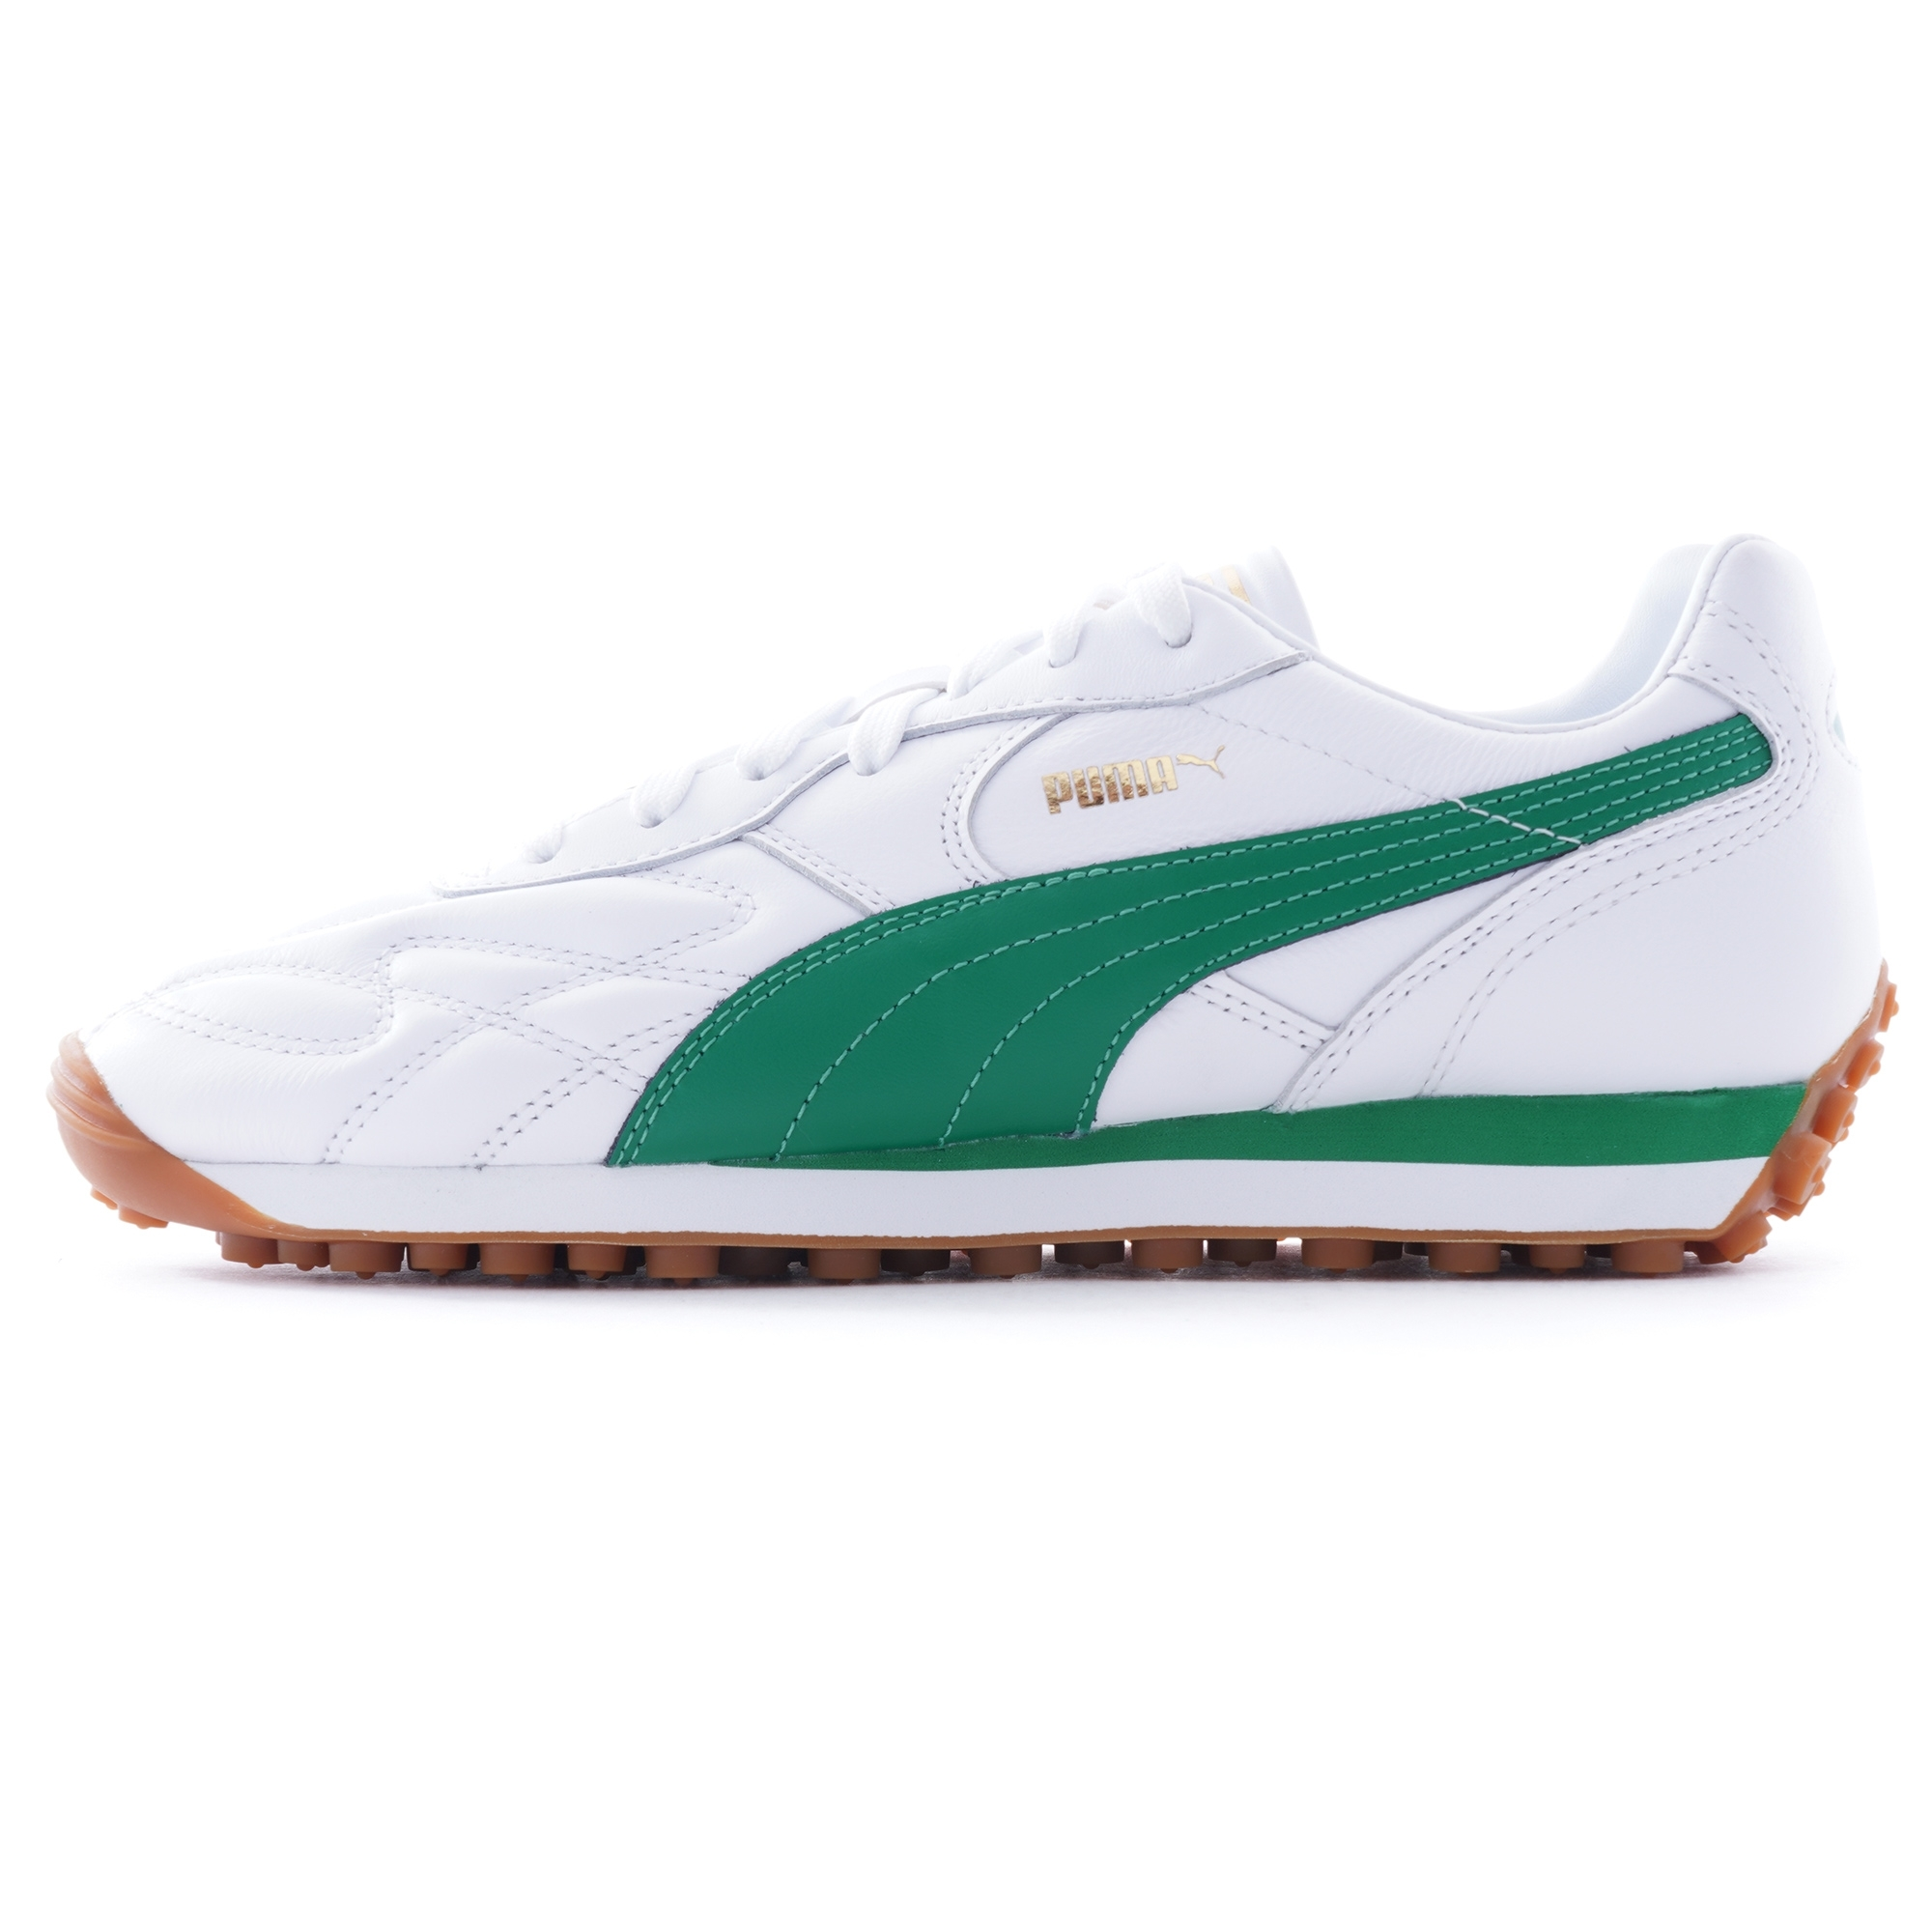 Puma Style Avanti - White/Green